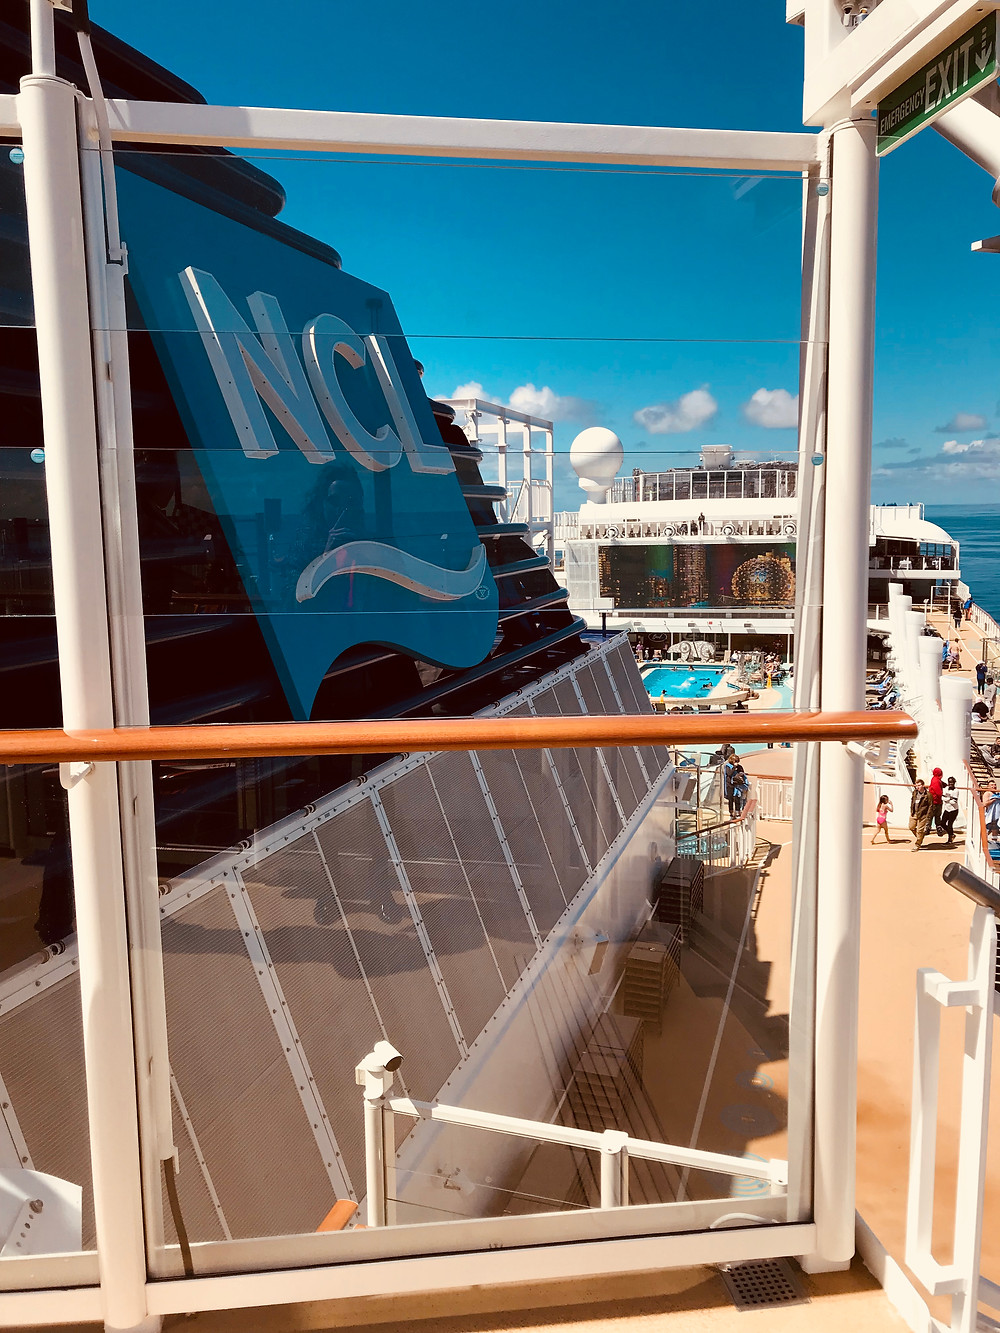 Norwegian Cruiseline. Bliss